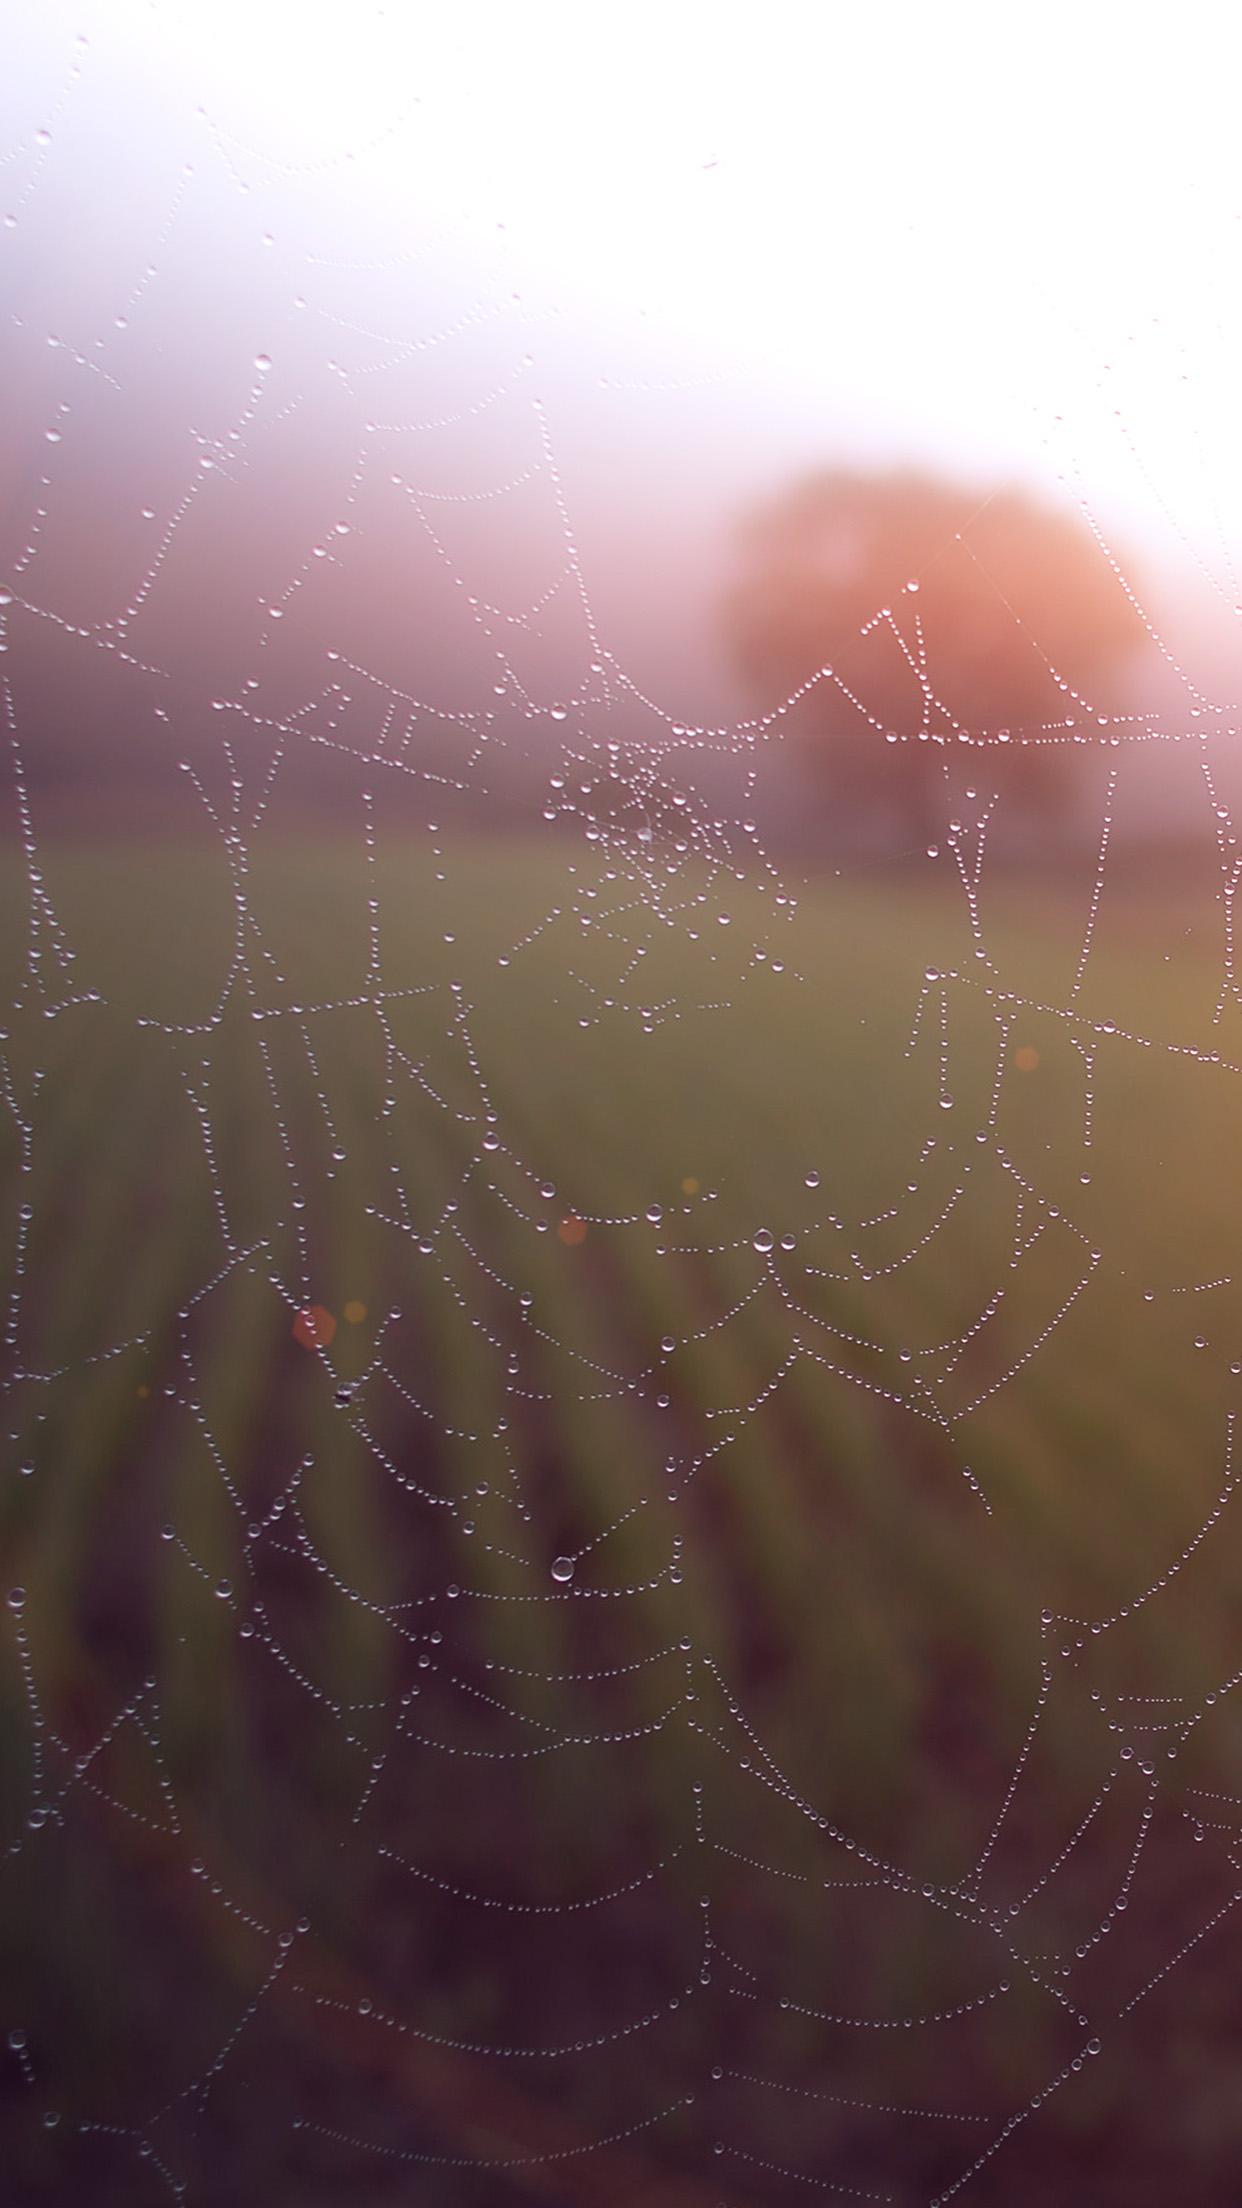 mv03-morning-dew-spider-web-rain-water ...